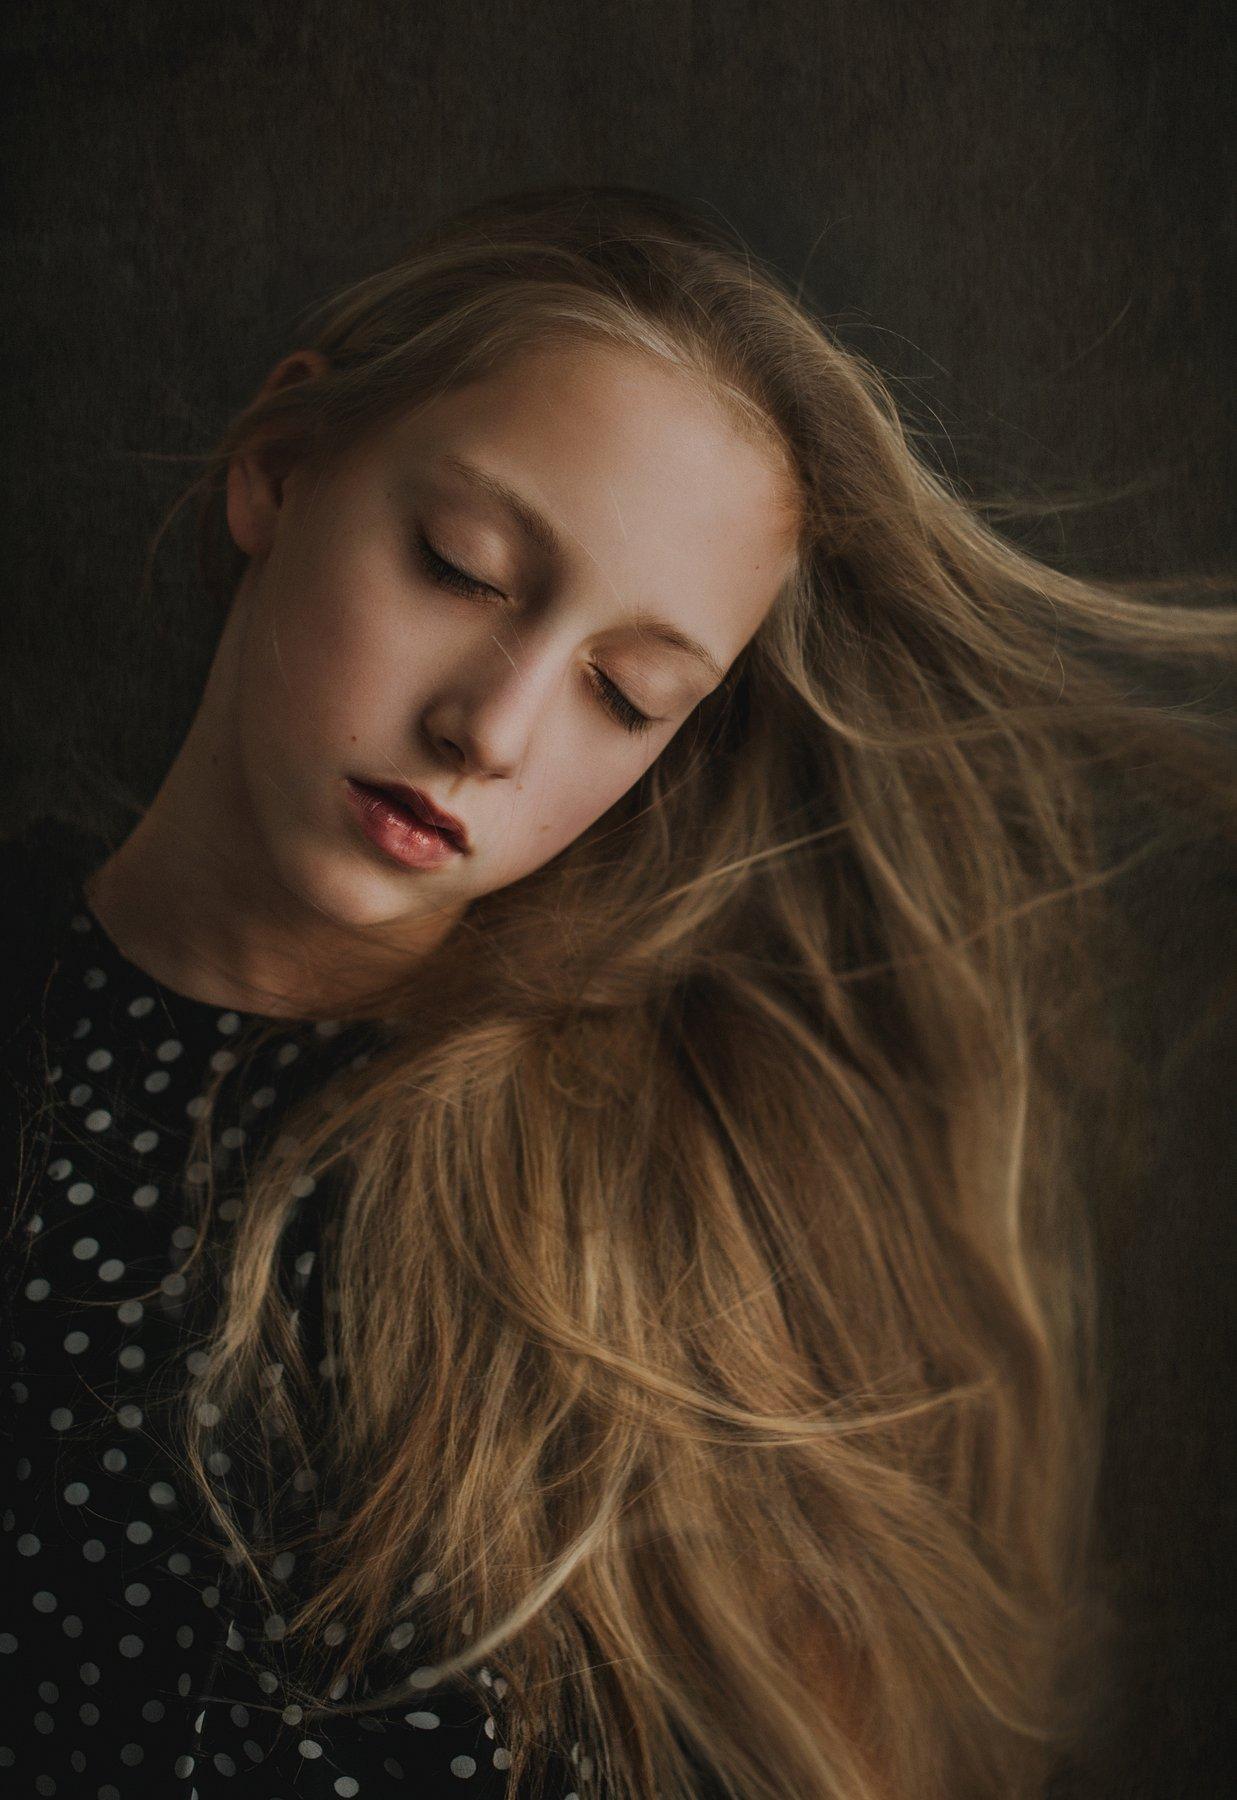 girl, portrait, eyes, look, natural-light, Ścigaj Anna